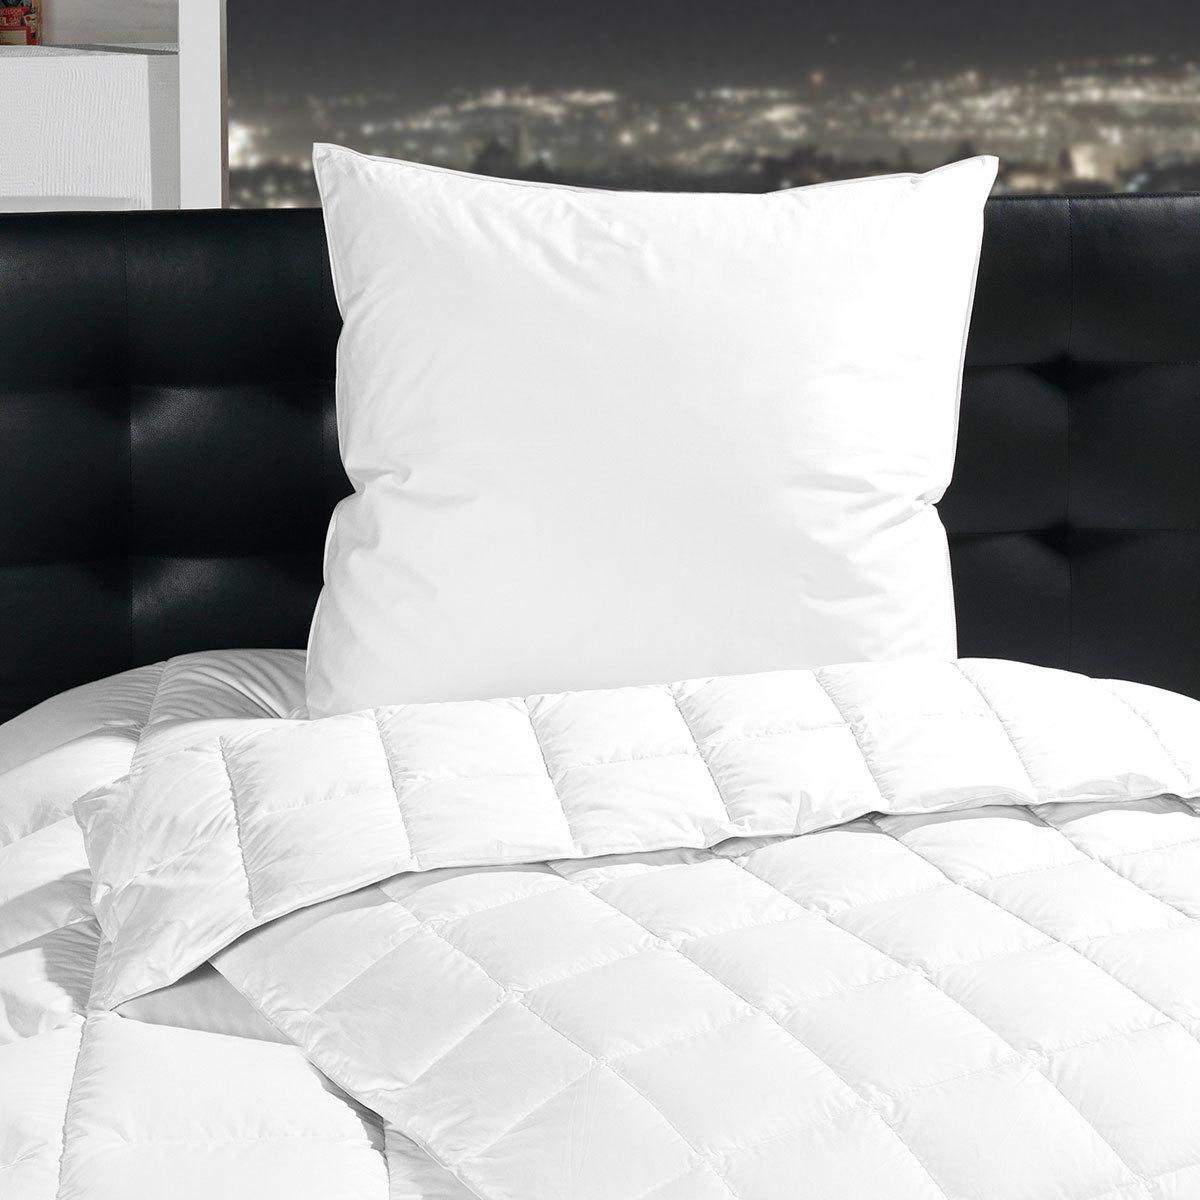 Häussling Kopfkissen City Comfort multi sleep medium